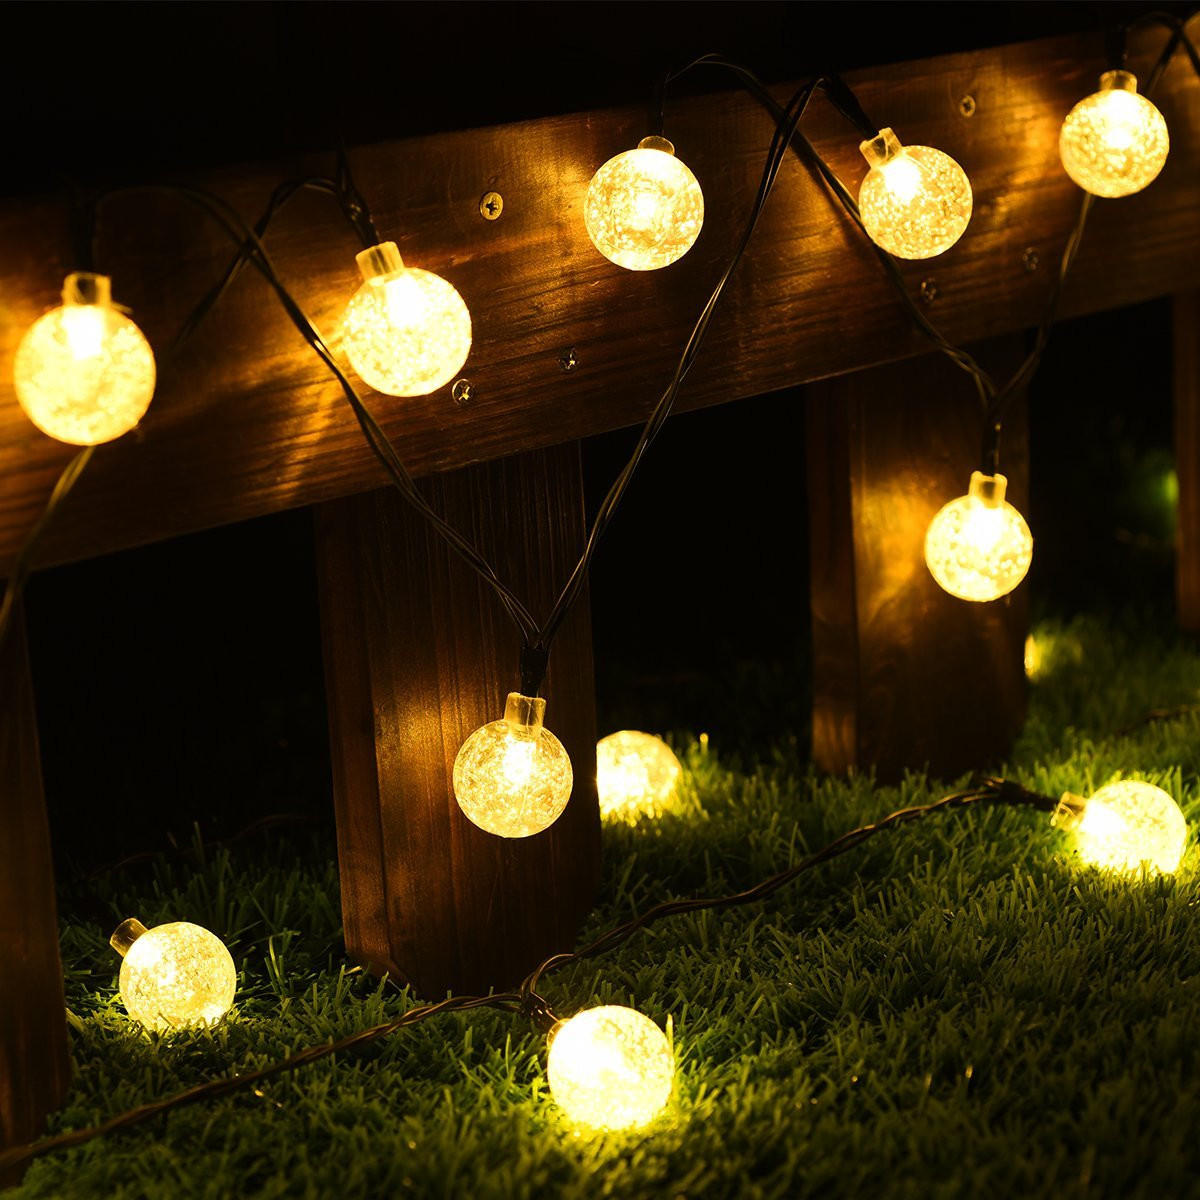 Home Decoration Solar Panel Box Led Light String Outdoor